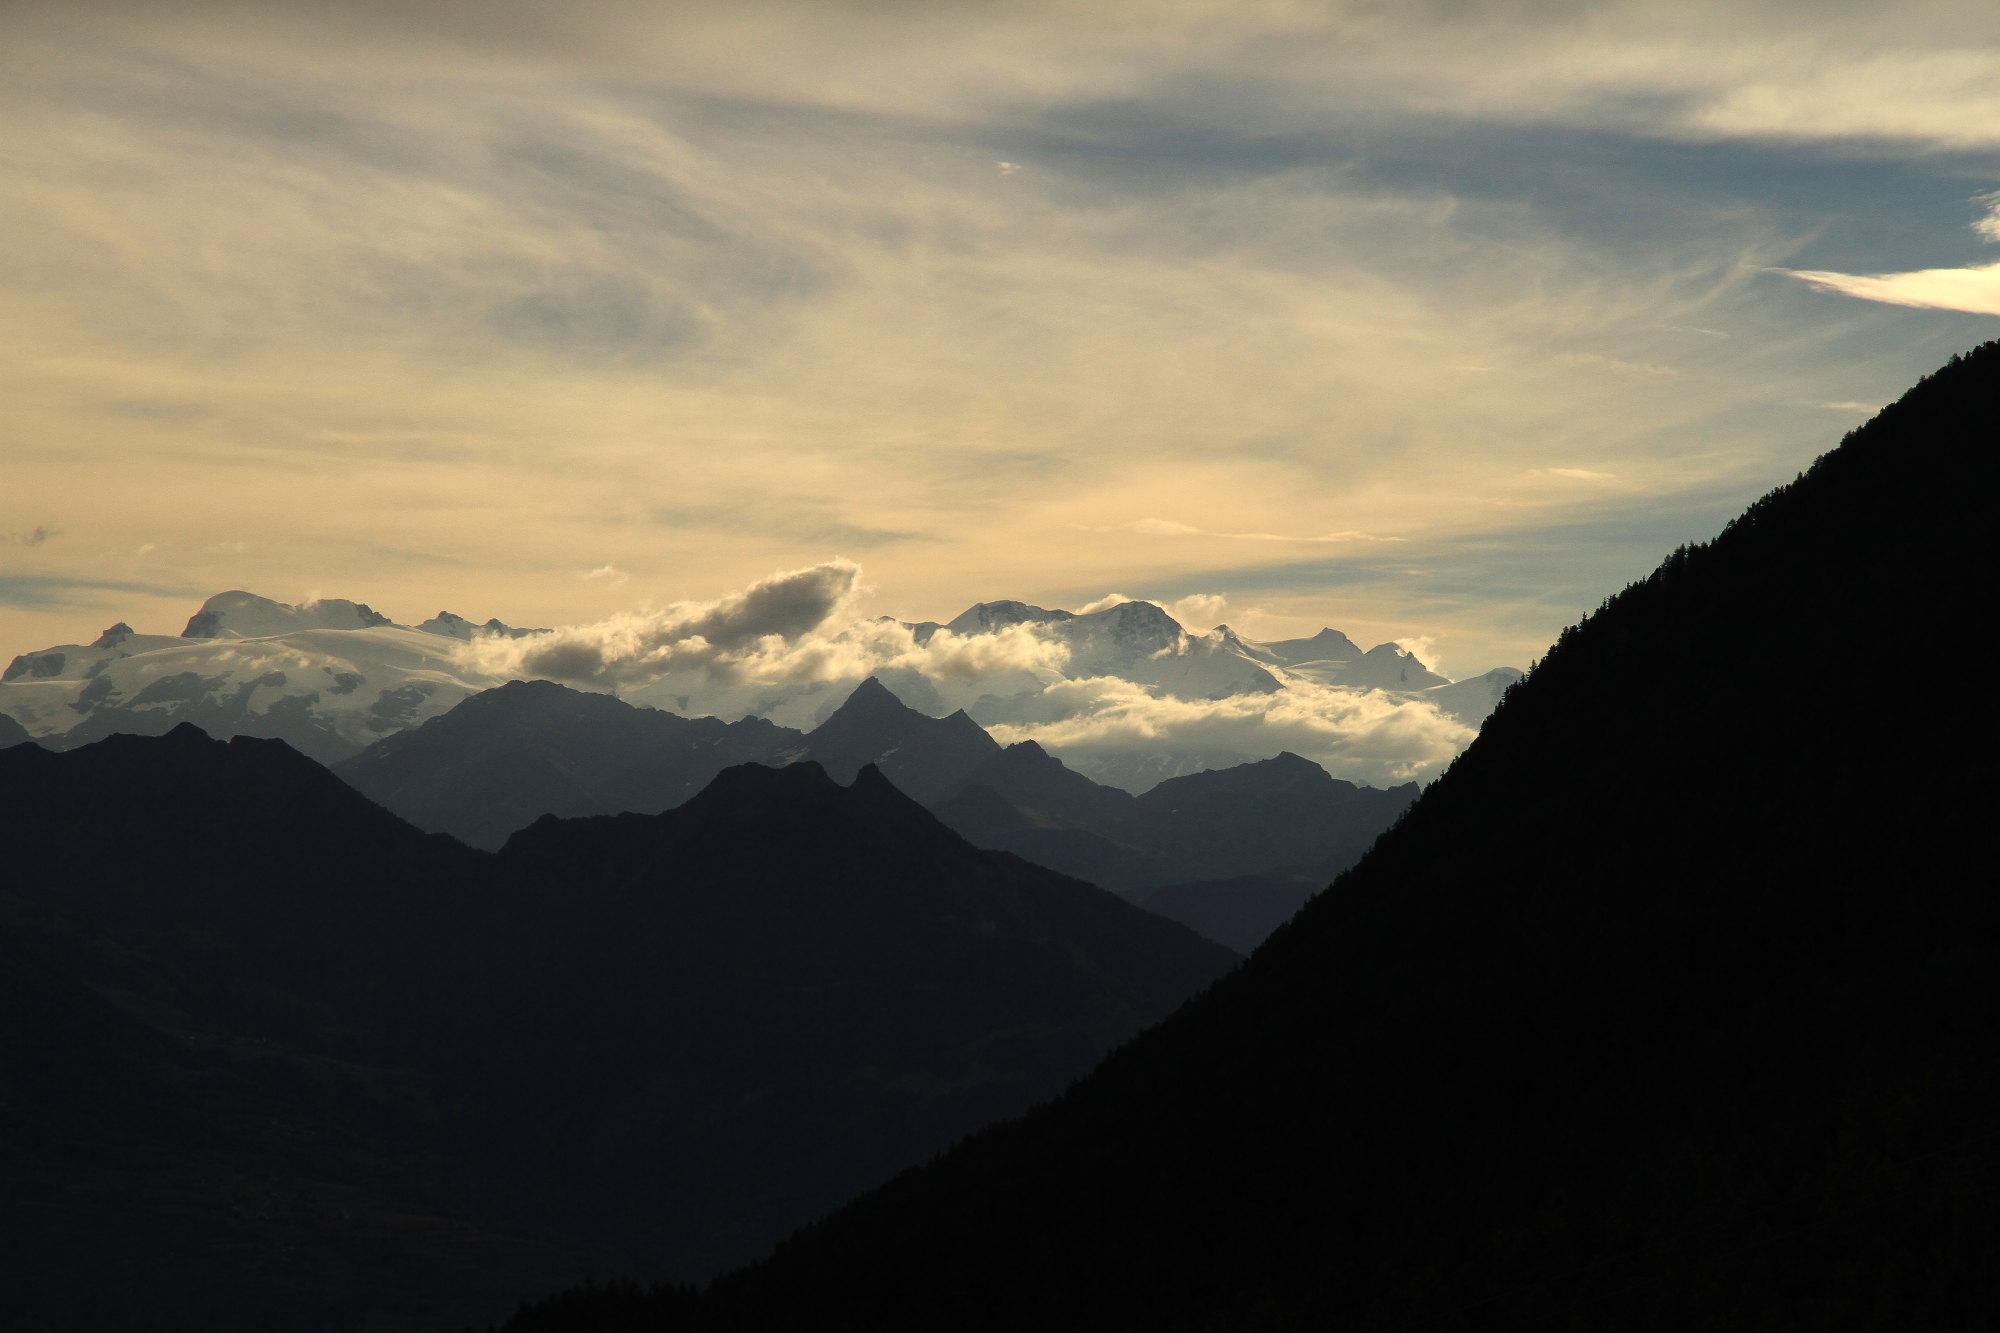 Ride Alpine Trails Mountainbike Freeride & Enduro Camp MTB Individuelle Tourenplanung Ride on